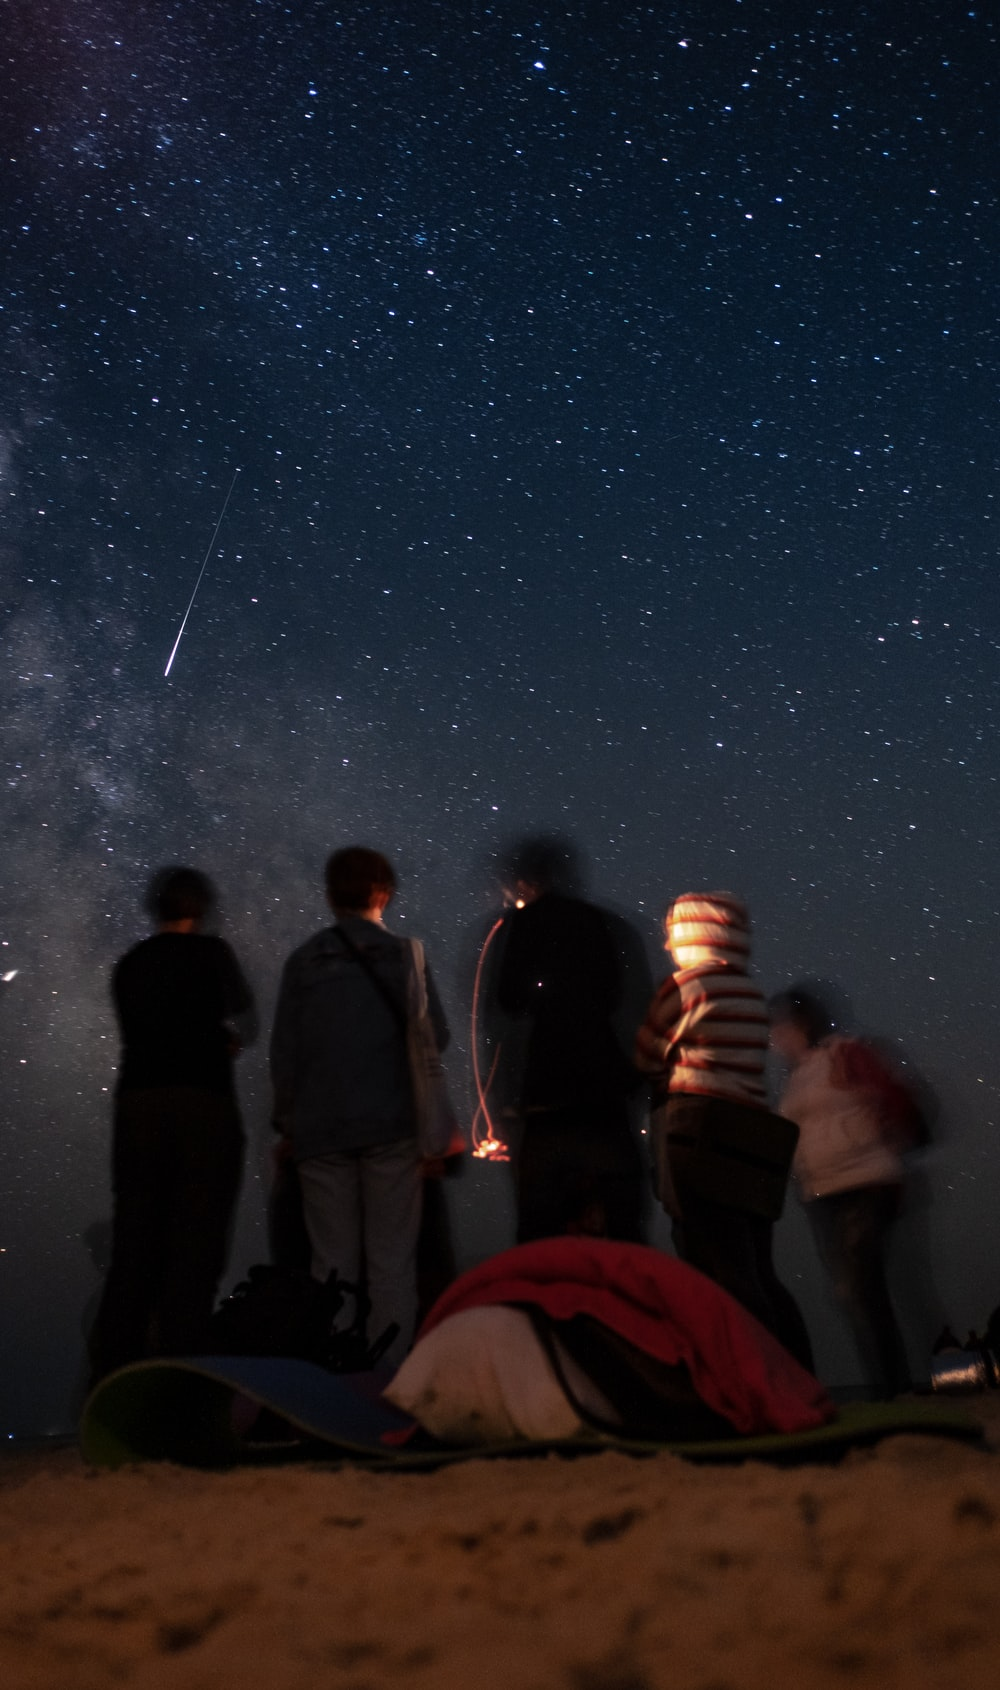 four men standing during nighttime